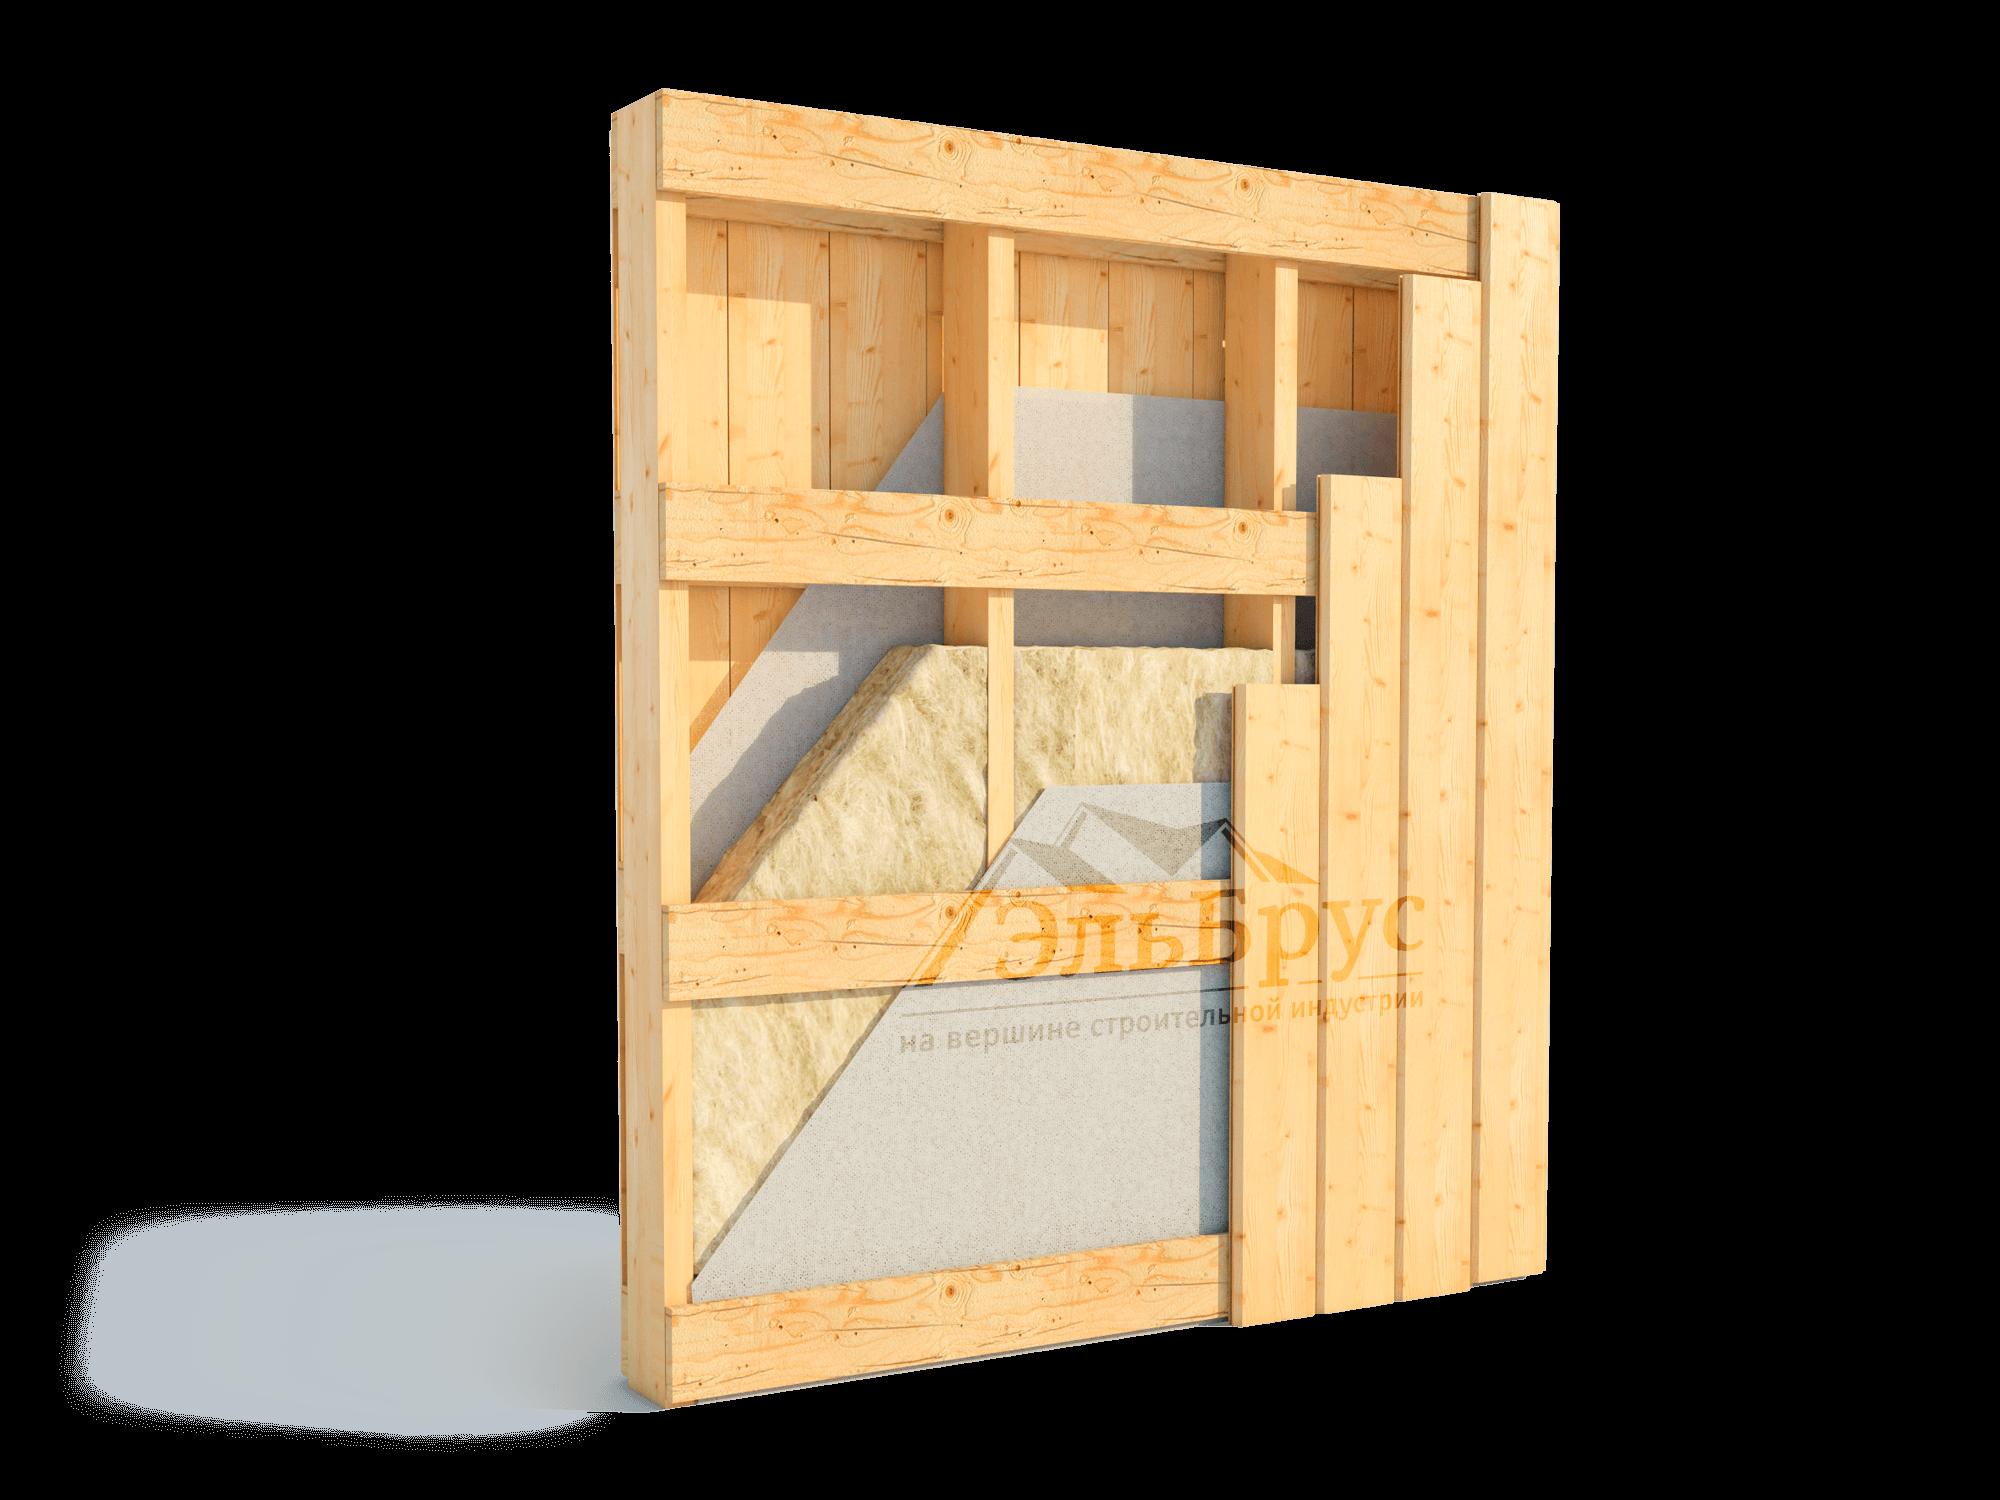 Конструкция внутренних перегородок каркасного дома